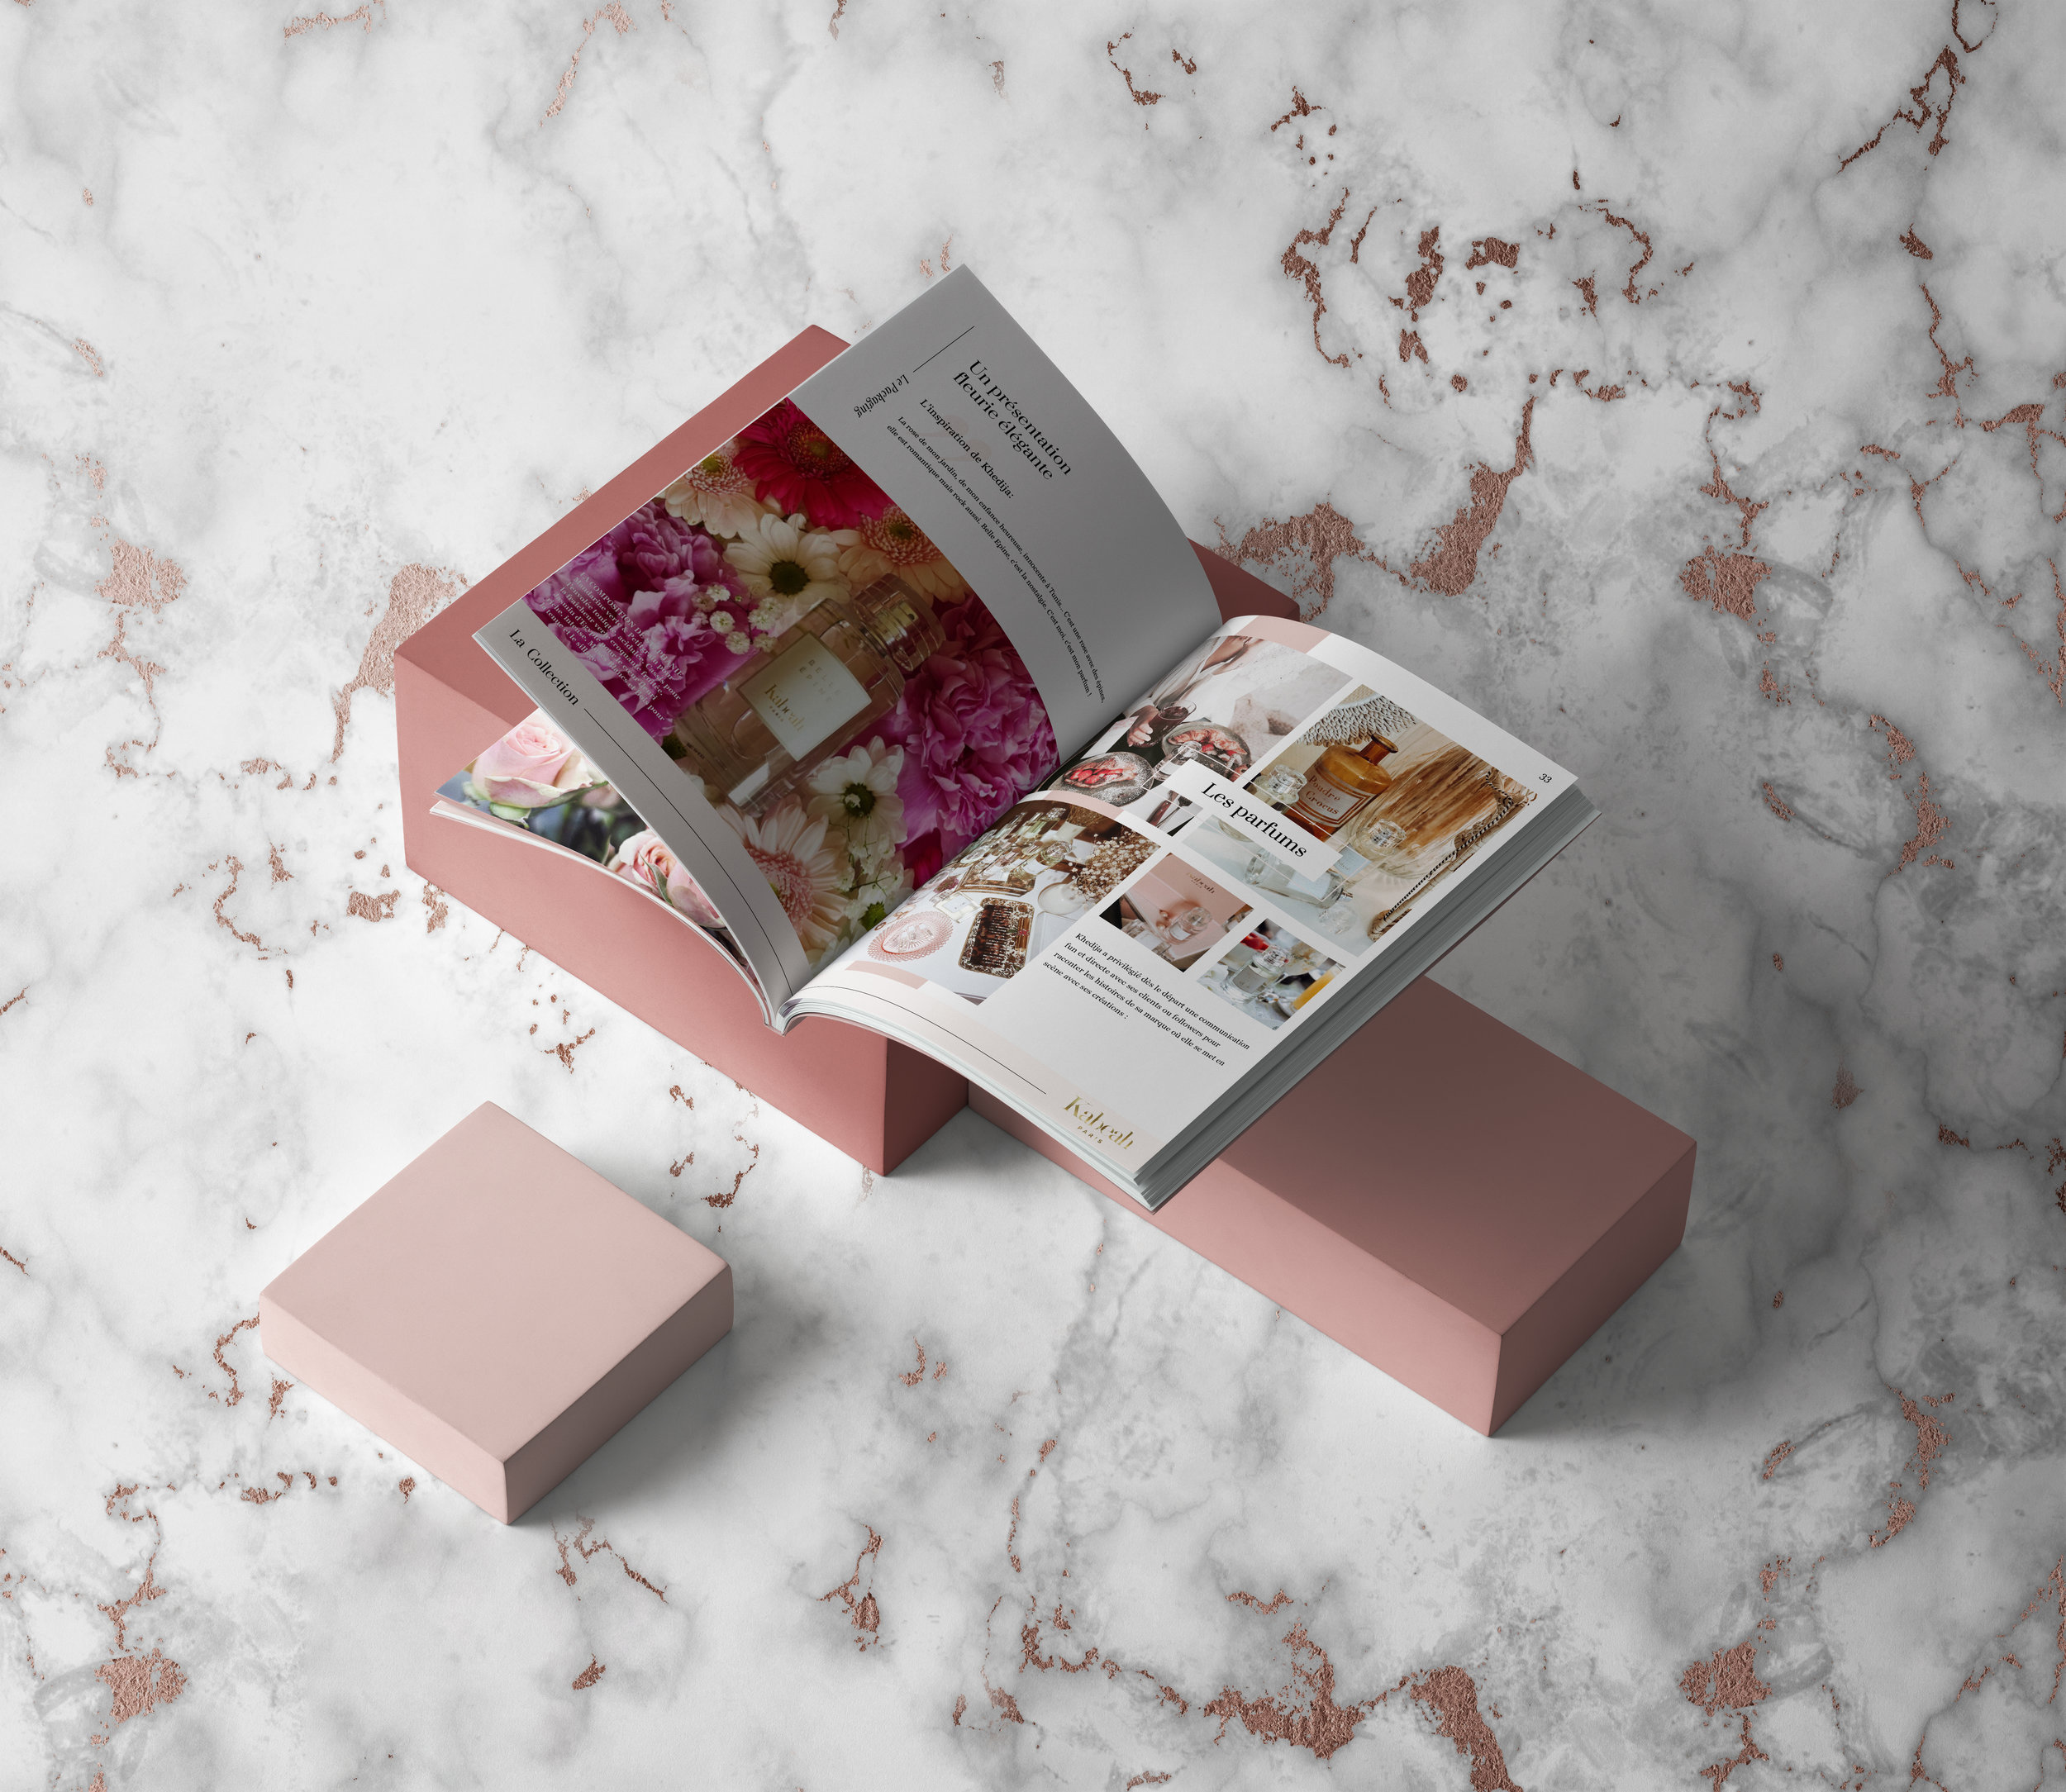 Kabeah Paris - Lookbook/Magazine design- English + French